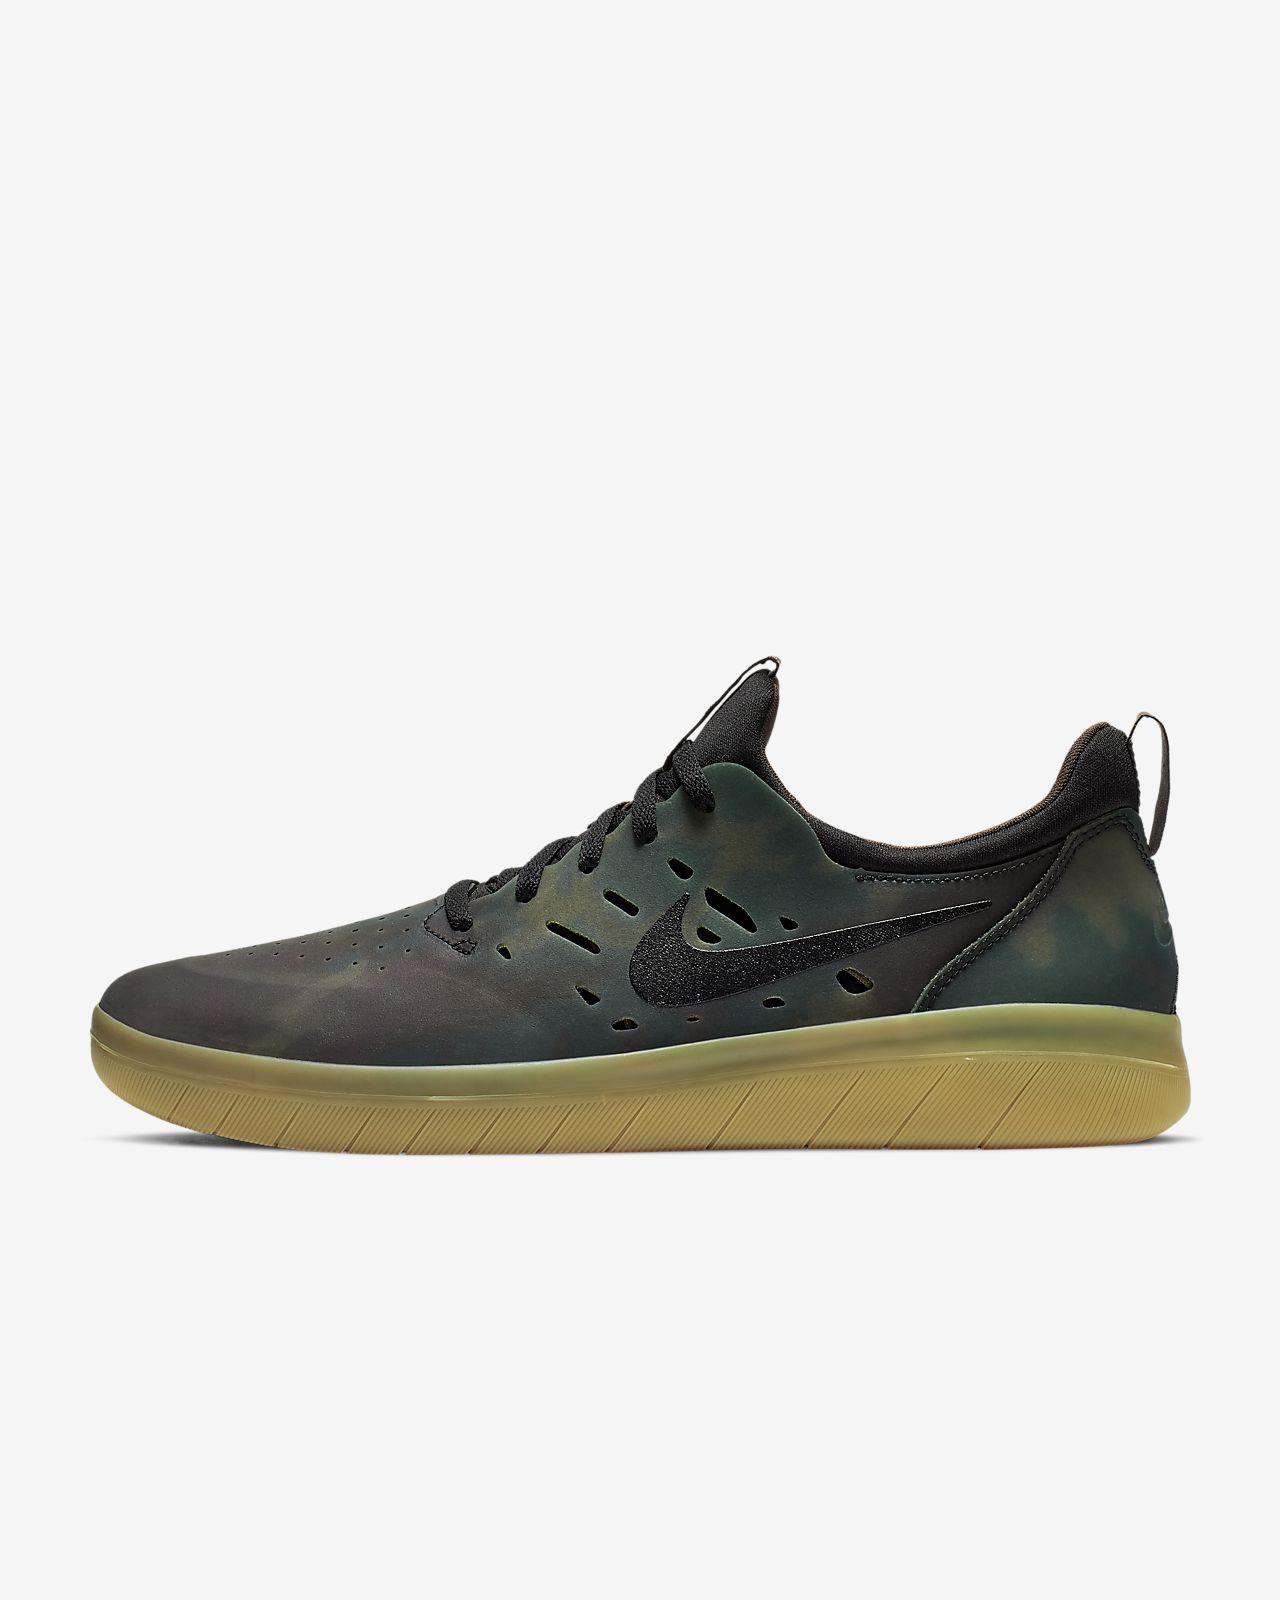 Buty do skateboardingu Nike SB Nyjah Free Premium